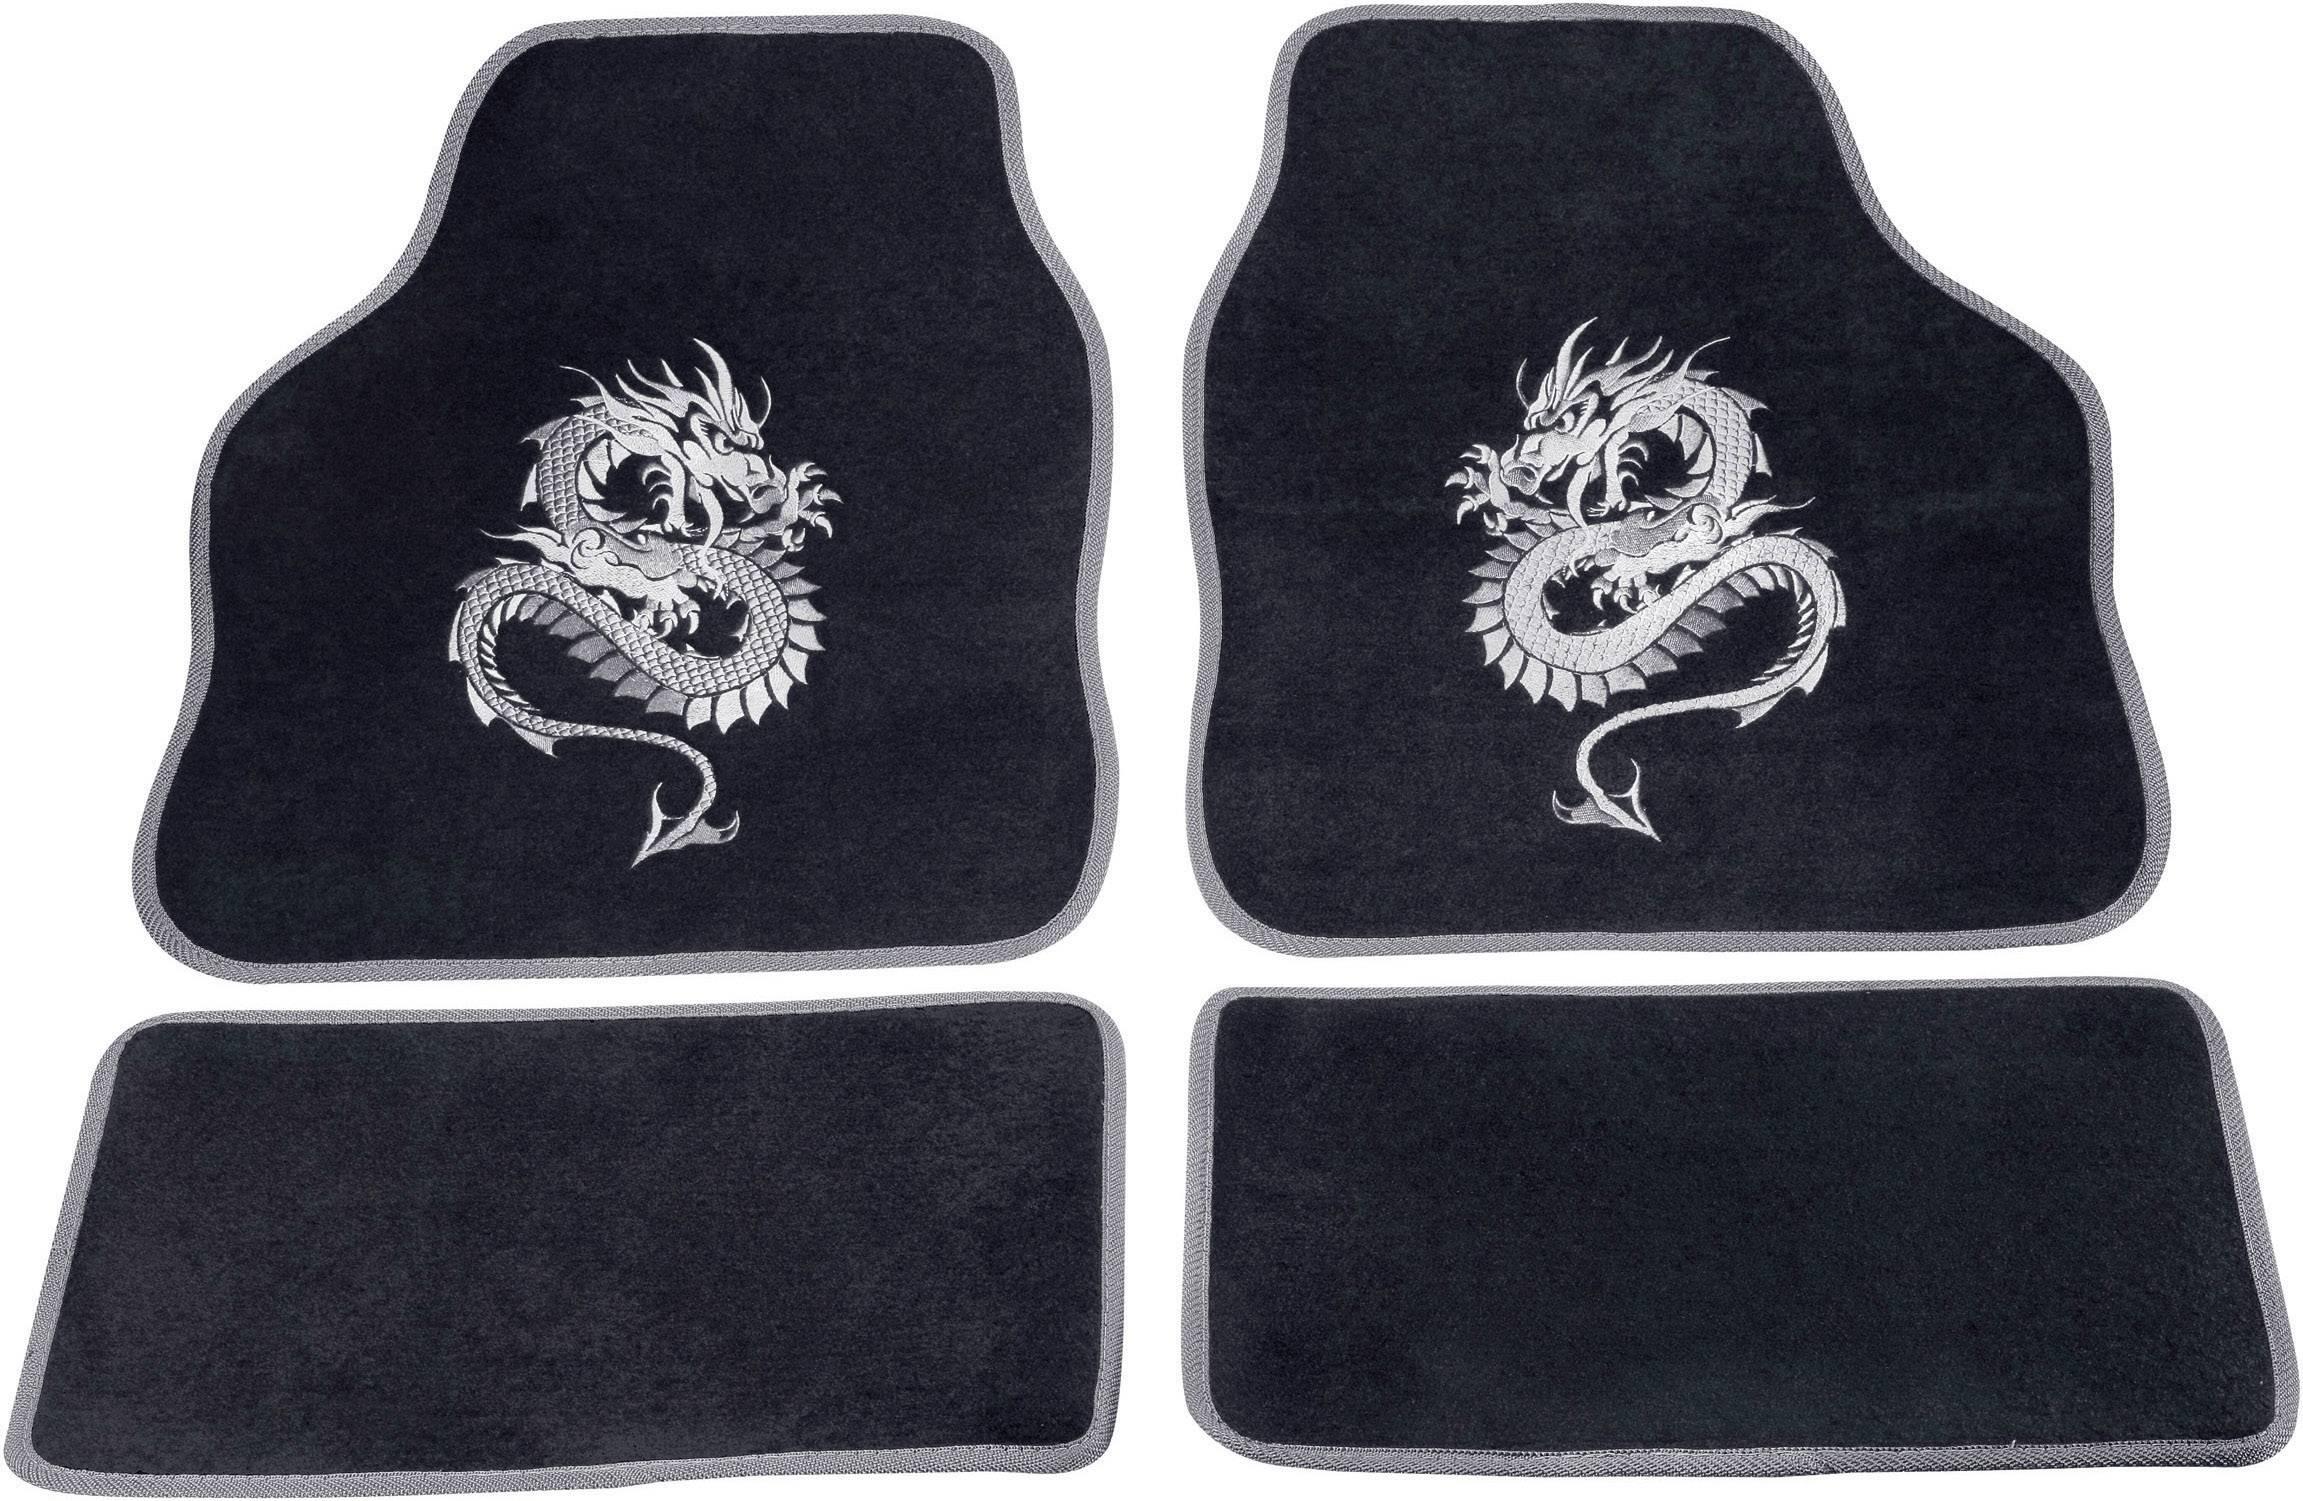 Rohožka (univerzálna) do auta cartrend 1400-03 1400-03, textil, strieborná